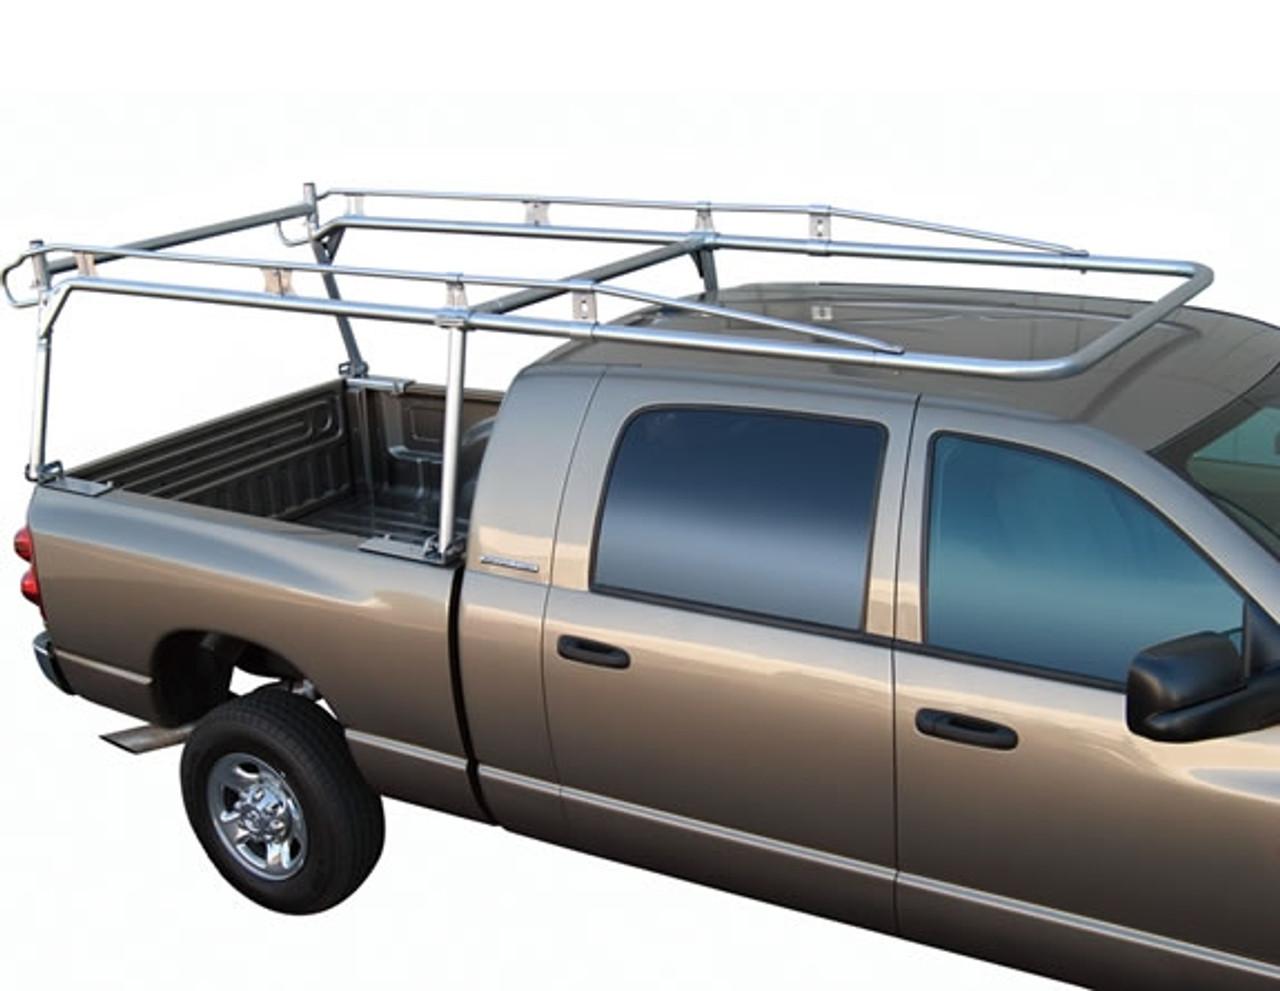 https leonardaccessories com product racks ladder racks kargo master pro iv hd aluminum